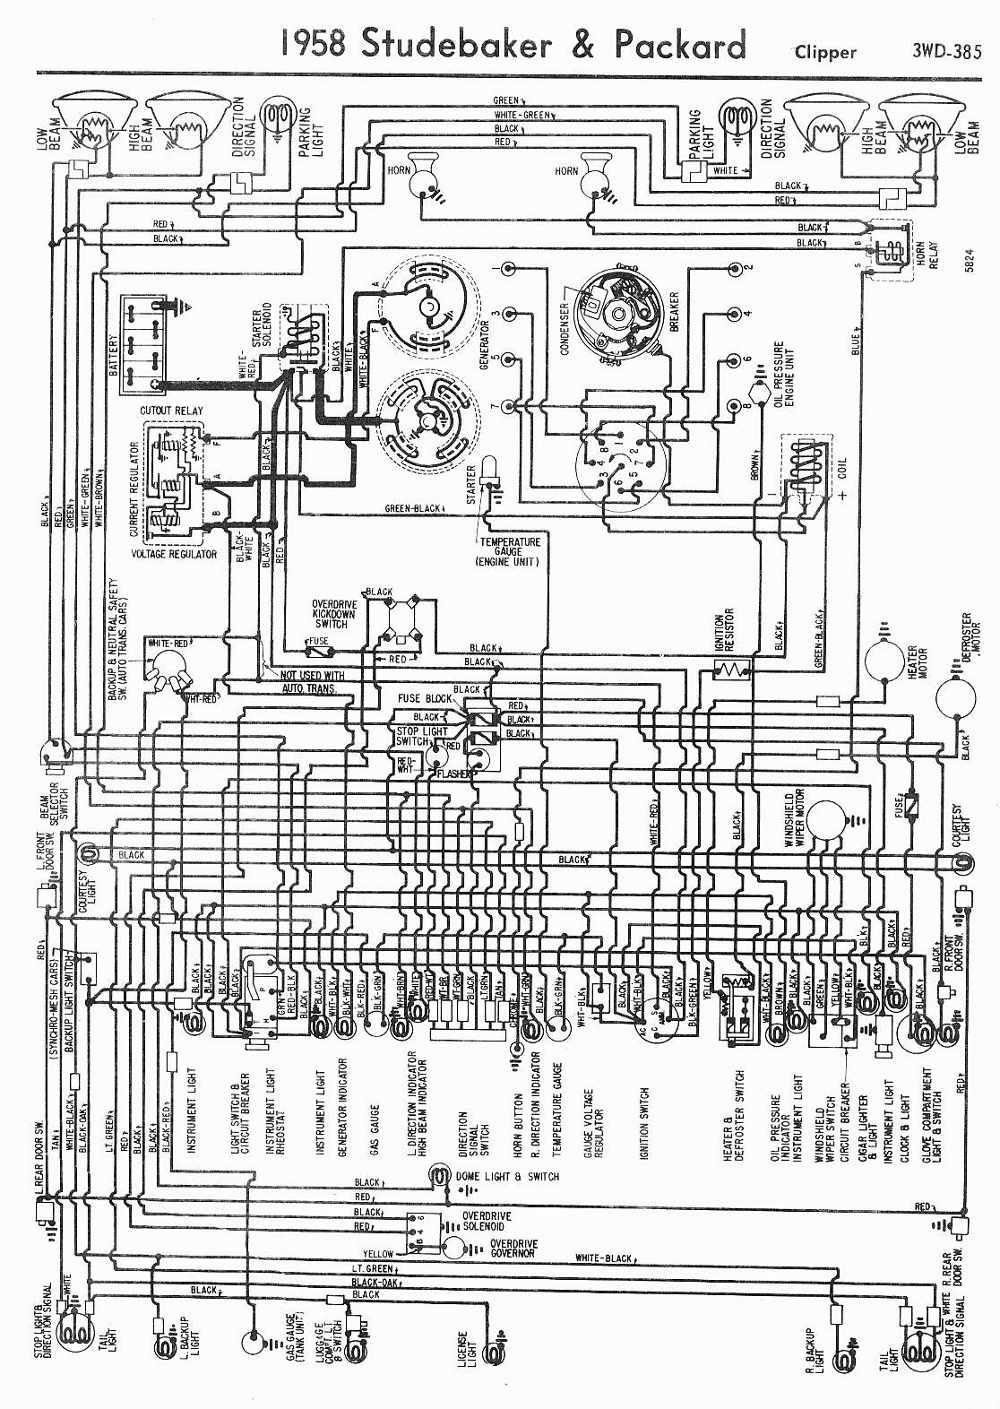 1950 Packard Wiring Diagram - Wiring Diagrams Data